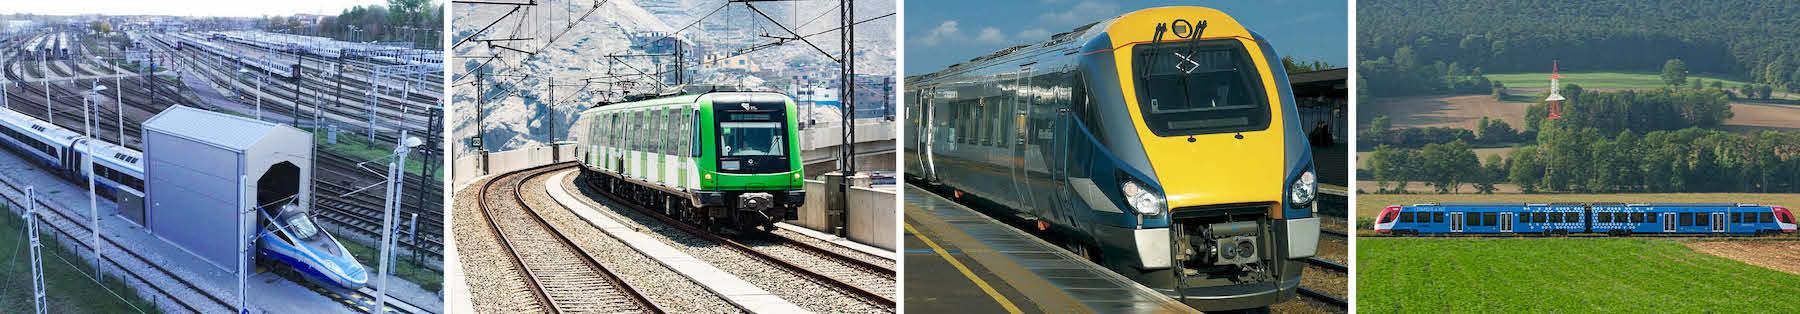 Alstom